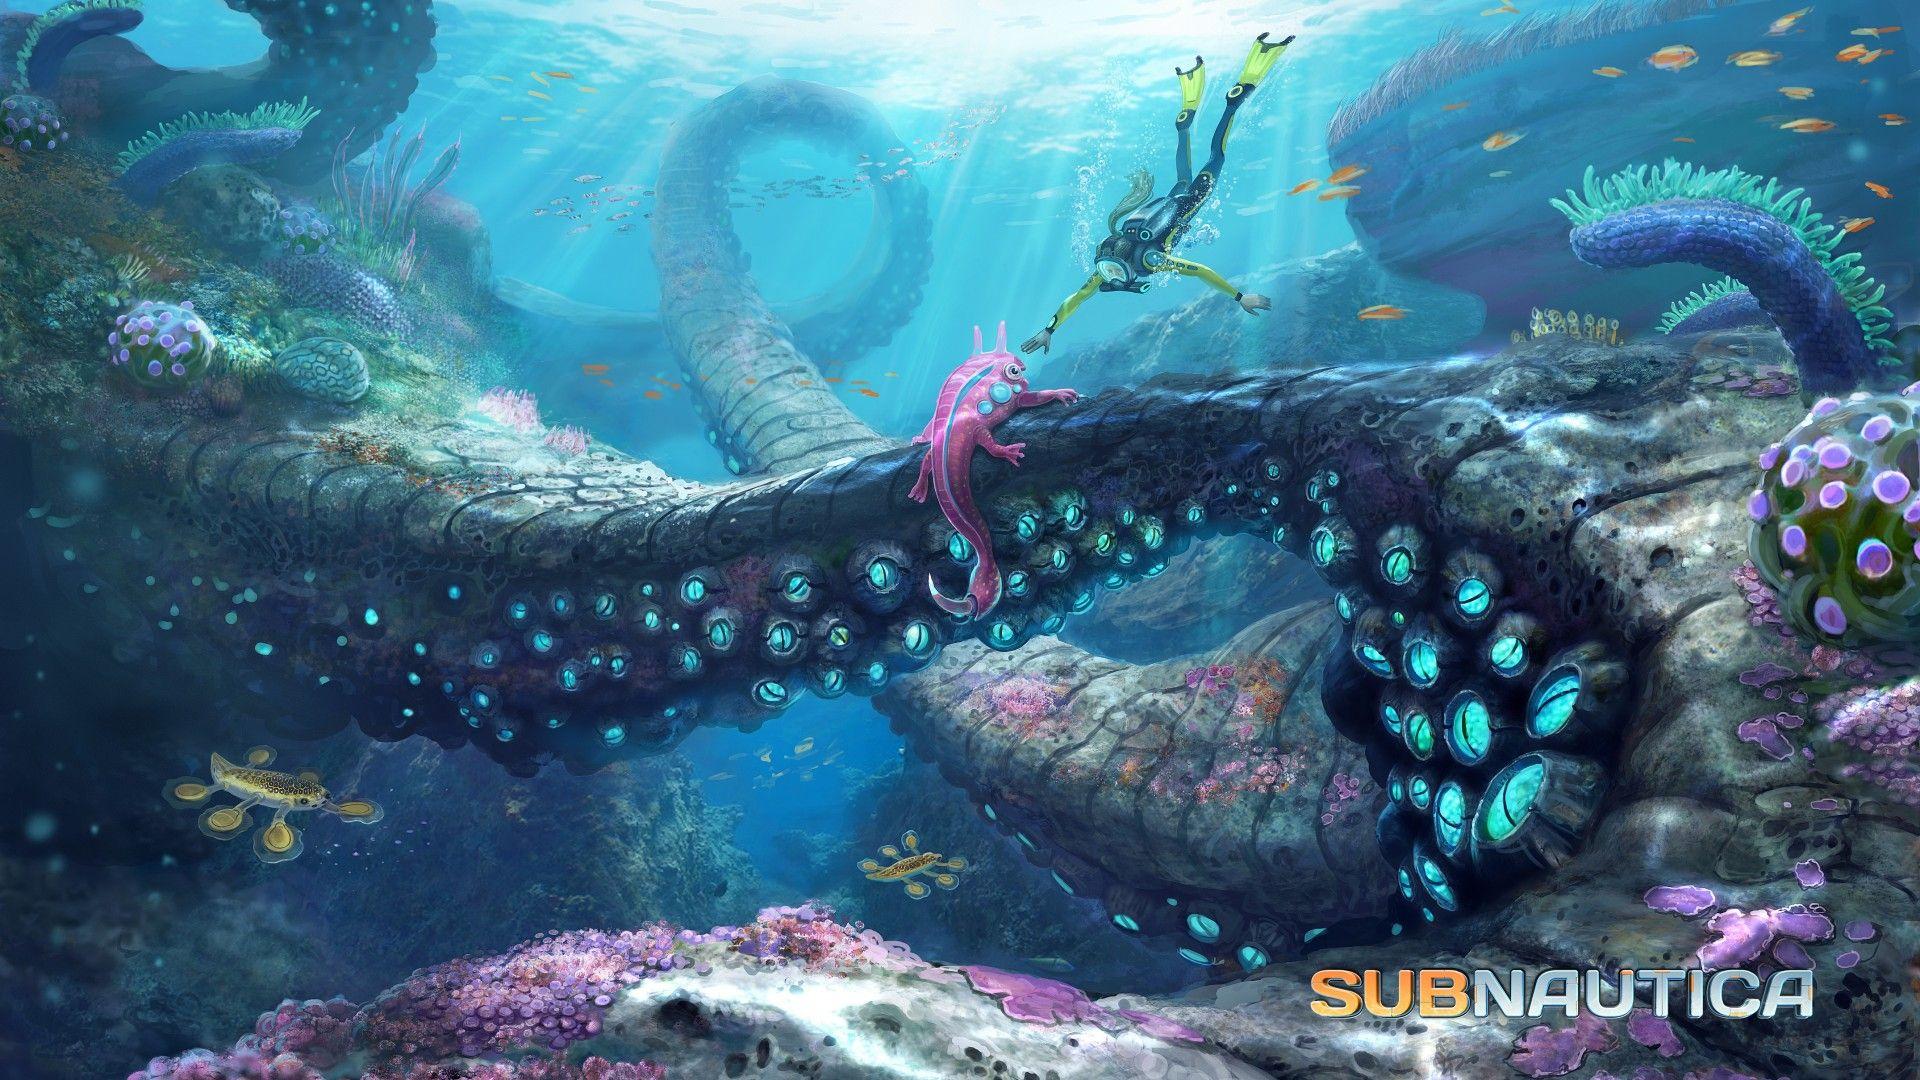 Subnautica Wallpaper Games Adventure Subnautica 2015 Game Diving Tentacles Octopus Sea Diver Bottom Blue S Subnautica Concept Art Concept Art Art